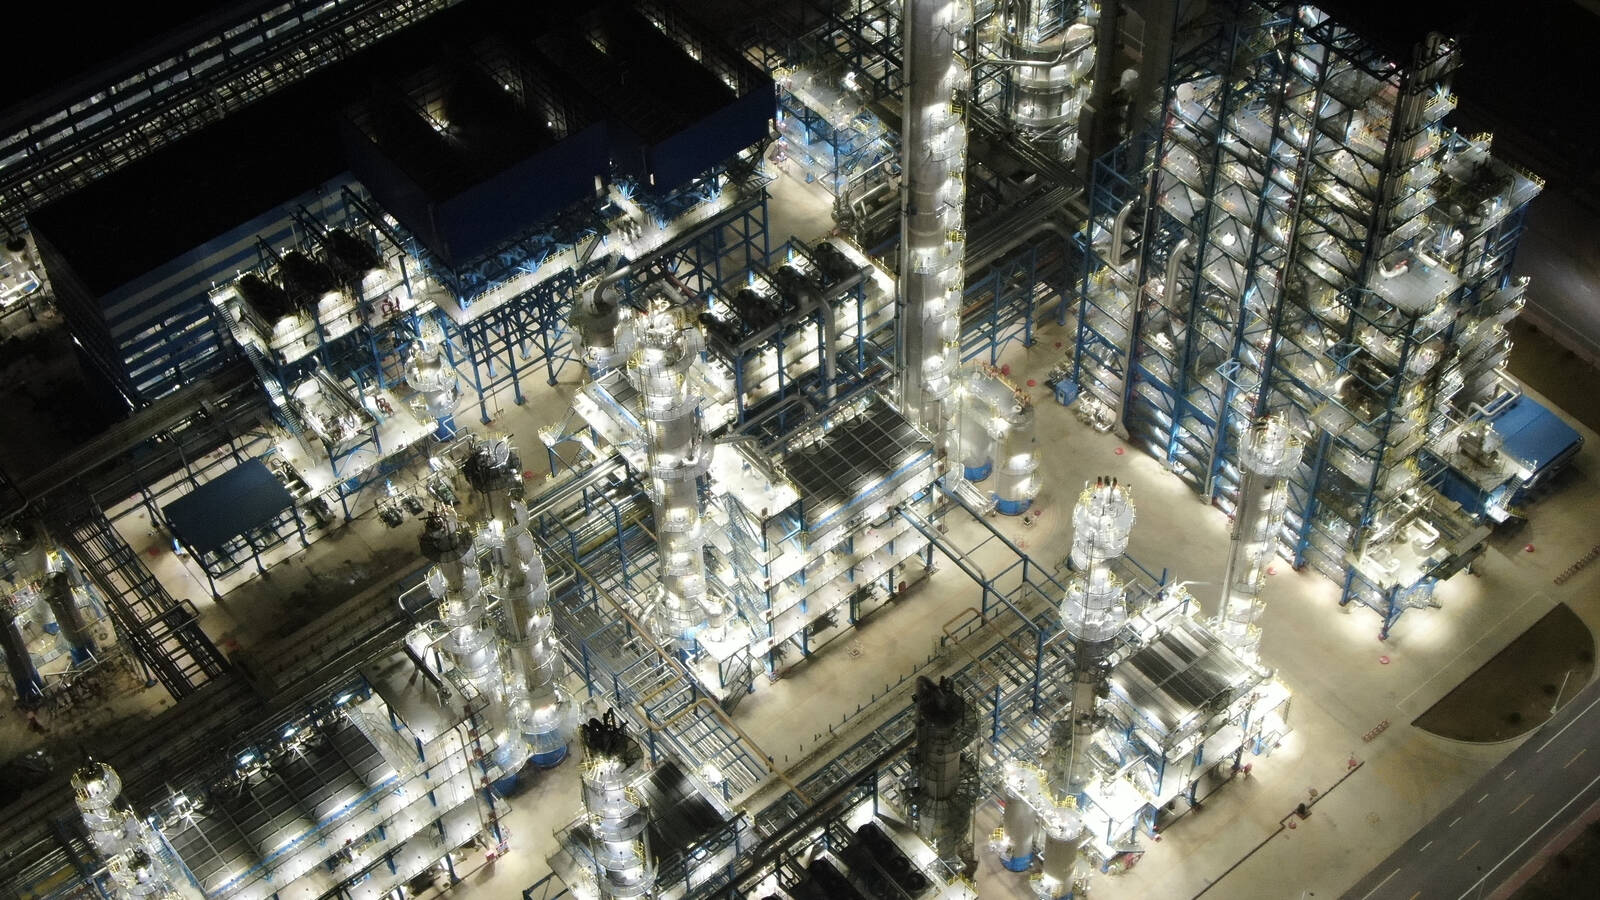 Petrochina Liaoyang Petrochemical Company in Liaoyang, northeast China's Liaoning Province. Credit Yang Qing/Xinhua via Getty